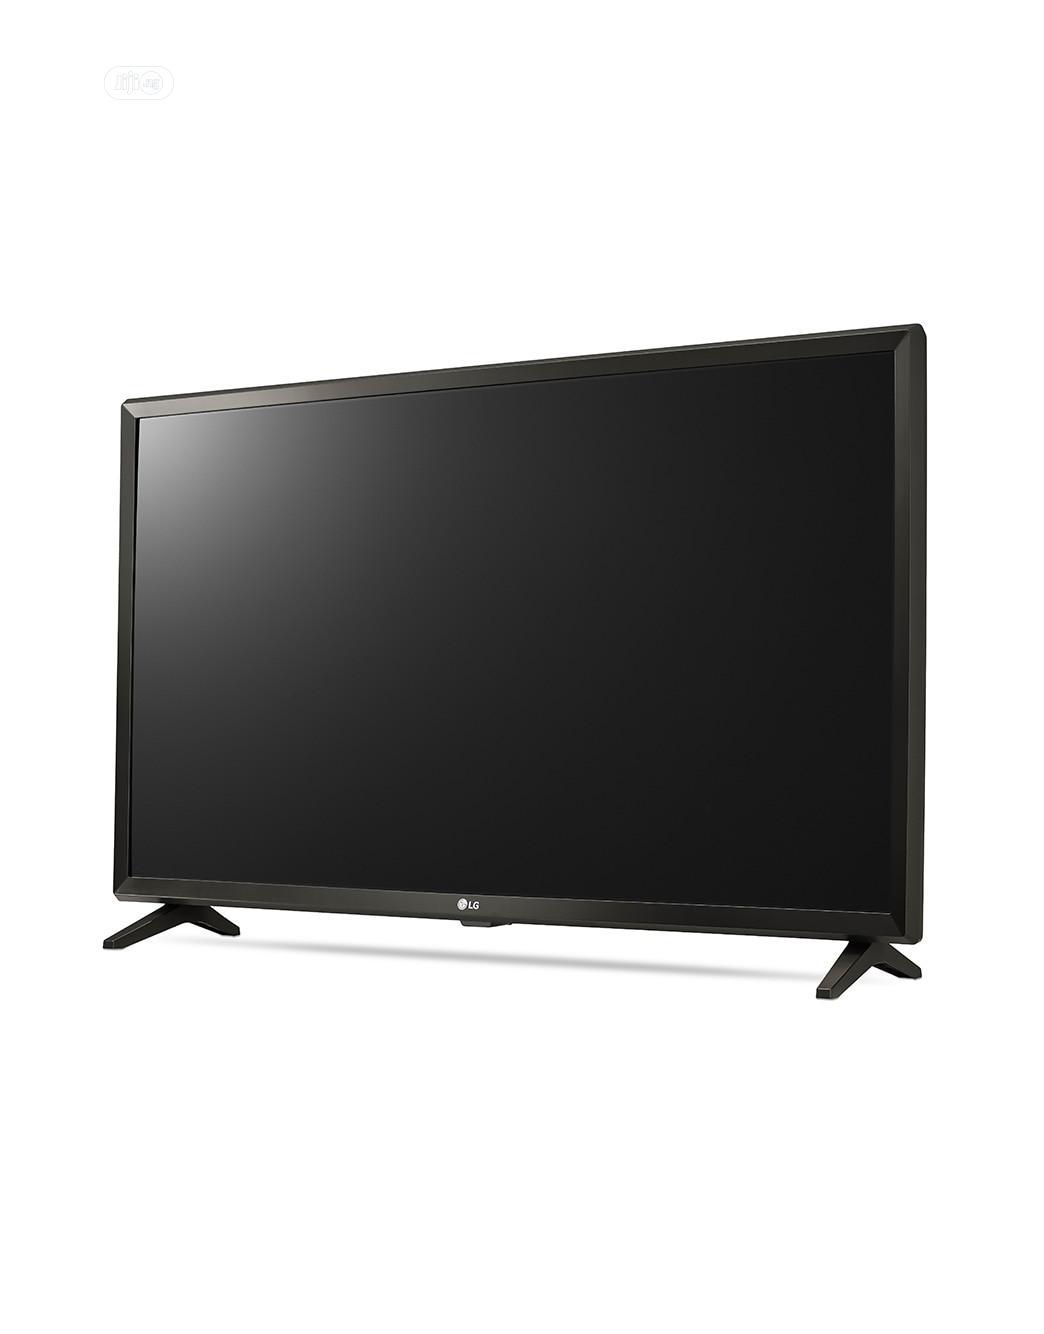 LG 32 Inch Smart LED TV (32lk510bpld)   TV & DVD Equipment for sale in Ojo, Lagos State, Nigeria